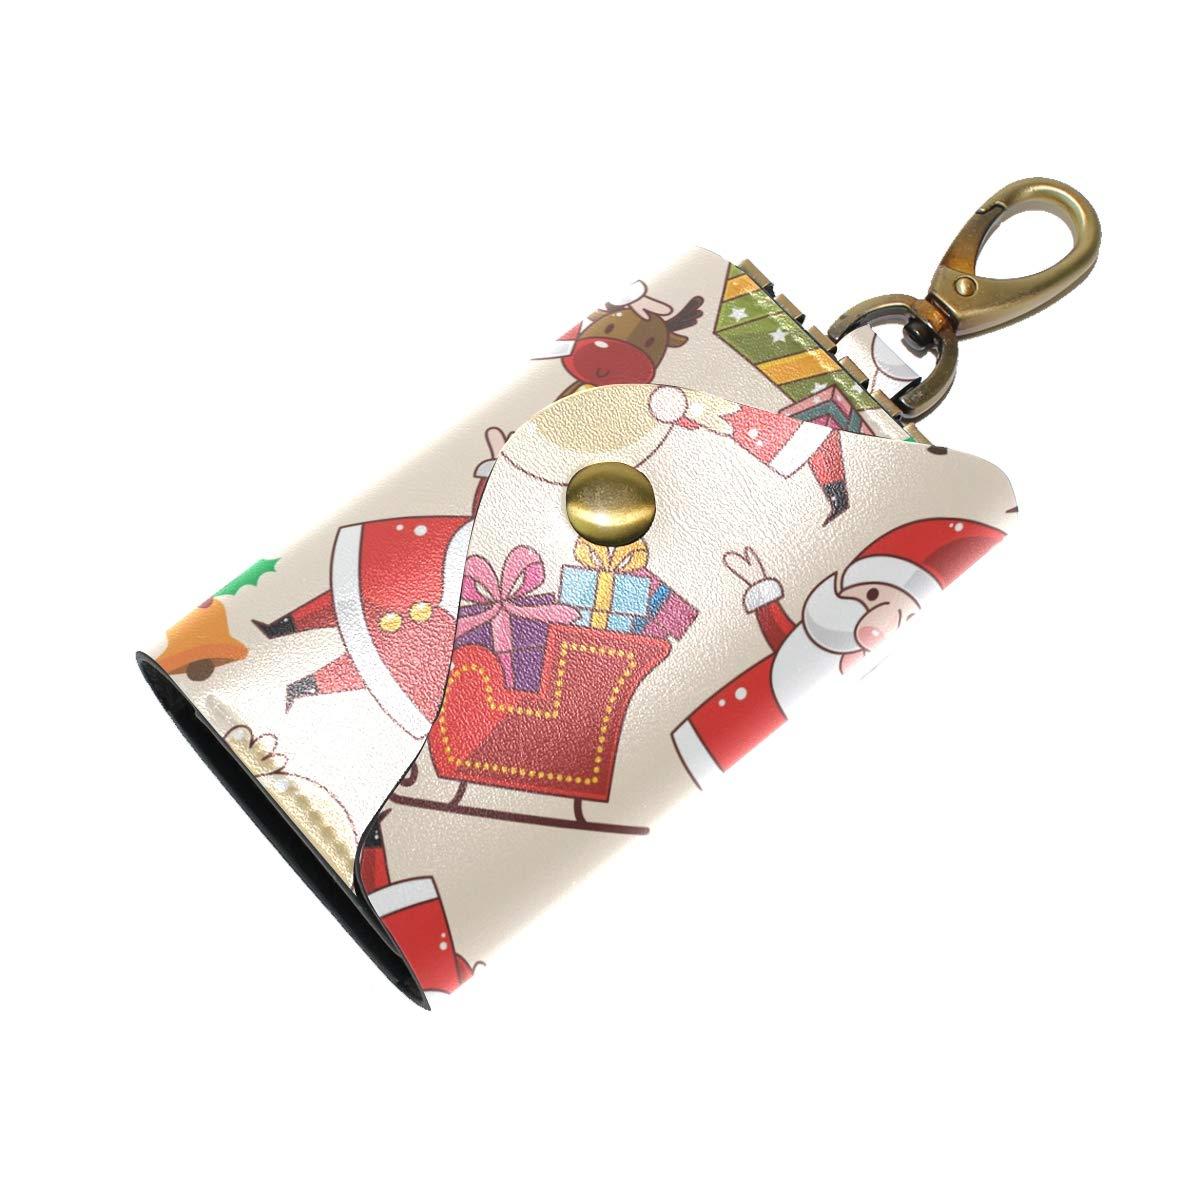 KEAKIA Christmas Santa Pattern Leather Key Case Wallets Tri-fold Key Holder Keychains with 6 Hooks 2 Slot Snap Closure for Men Women